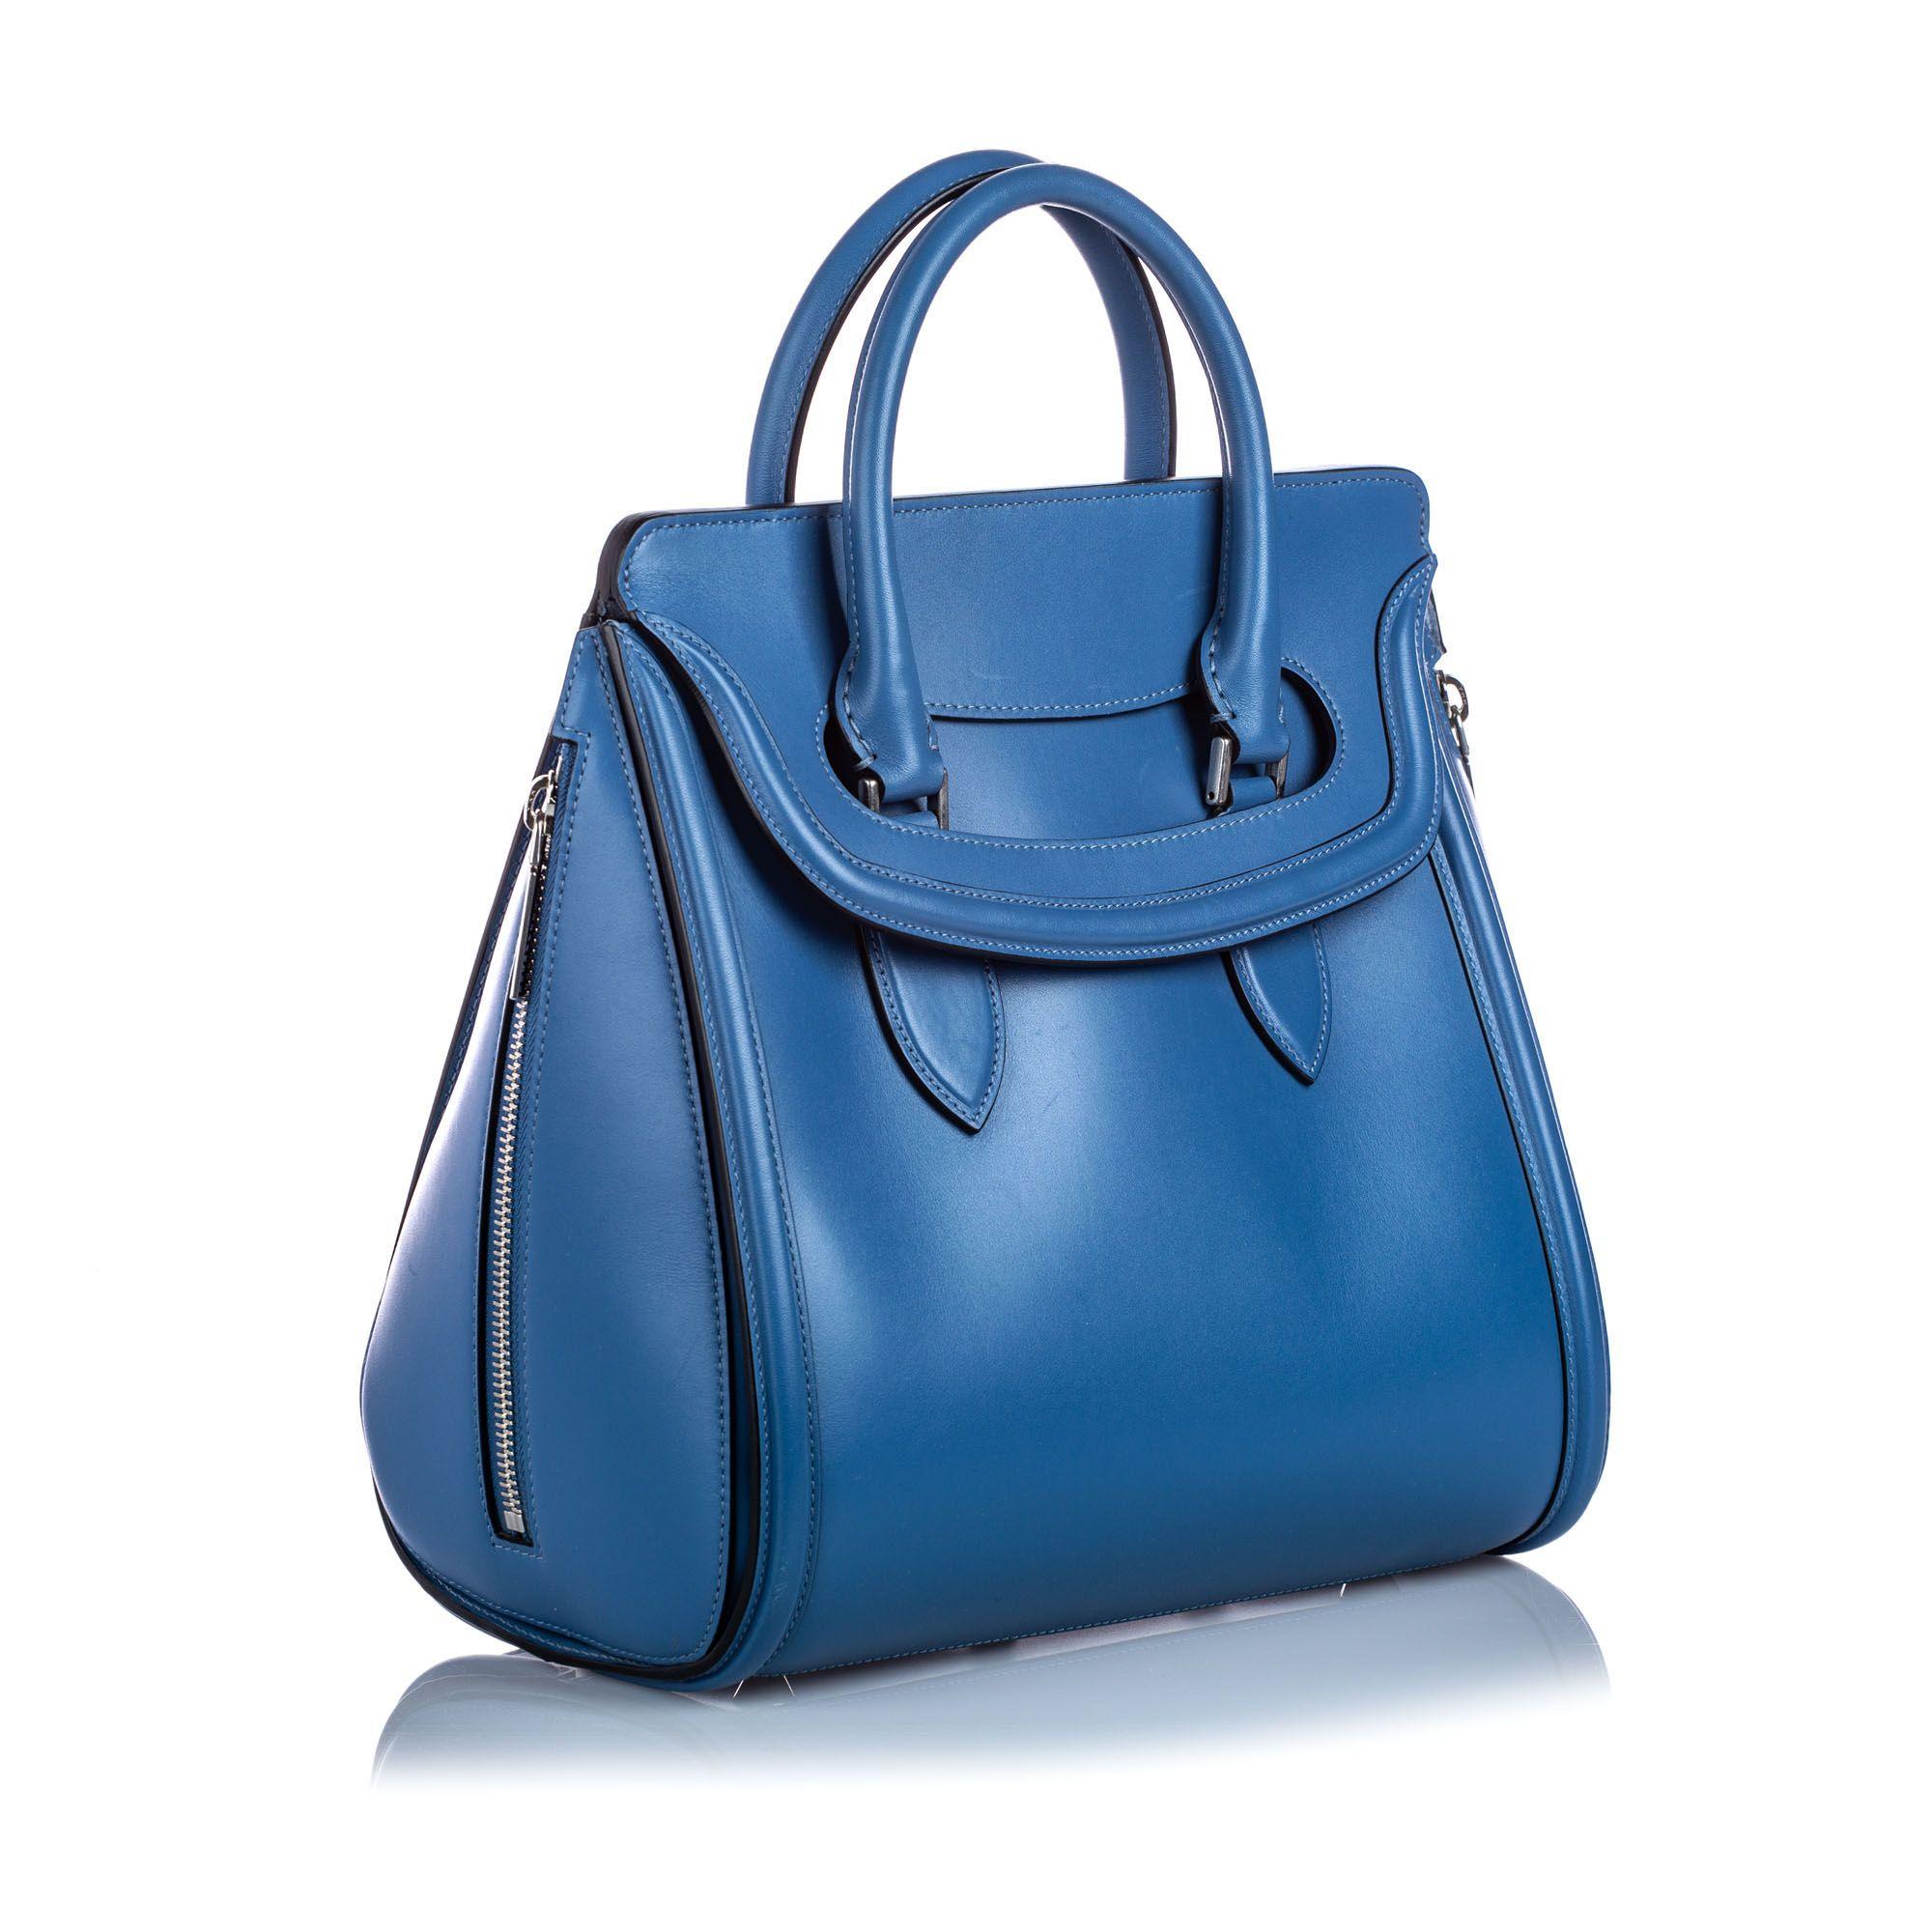 Vintage Alexander McQueen Large Leather Heroine Handbag Blue